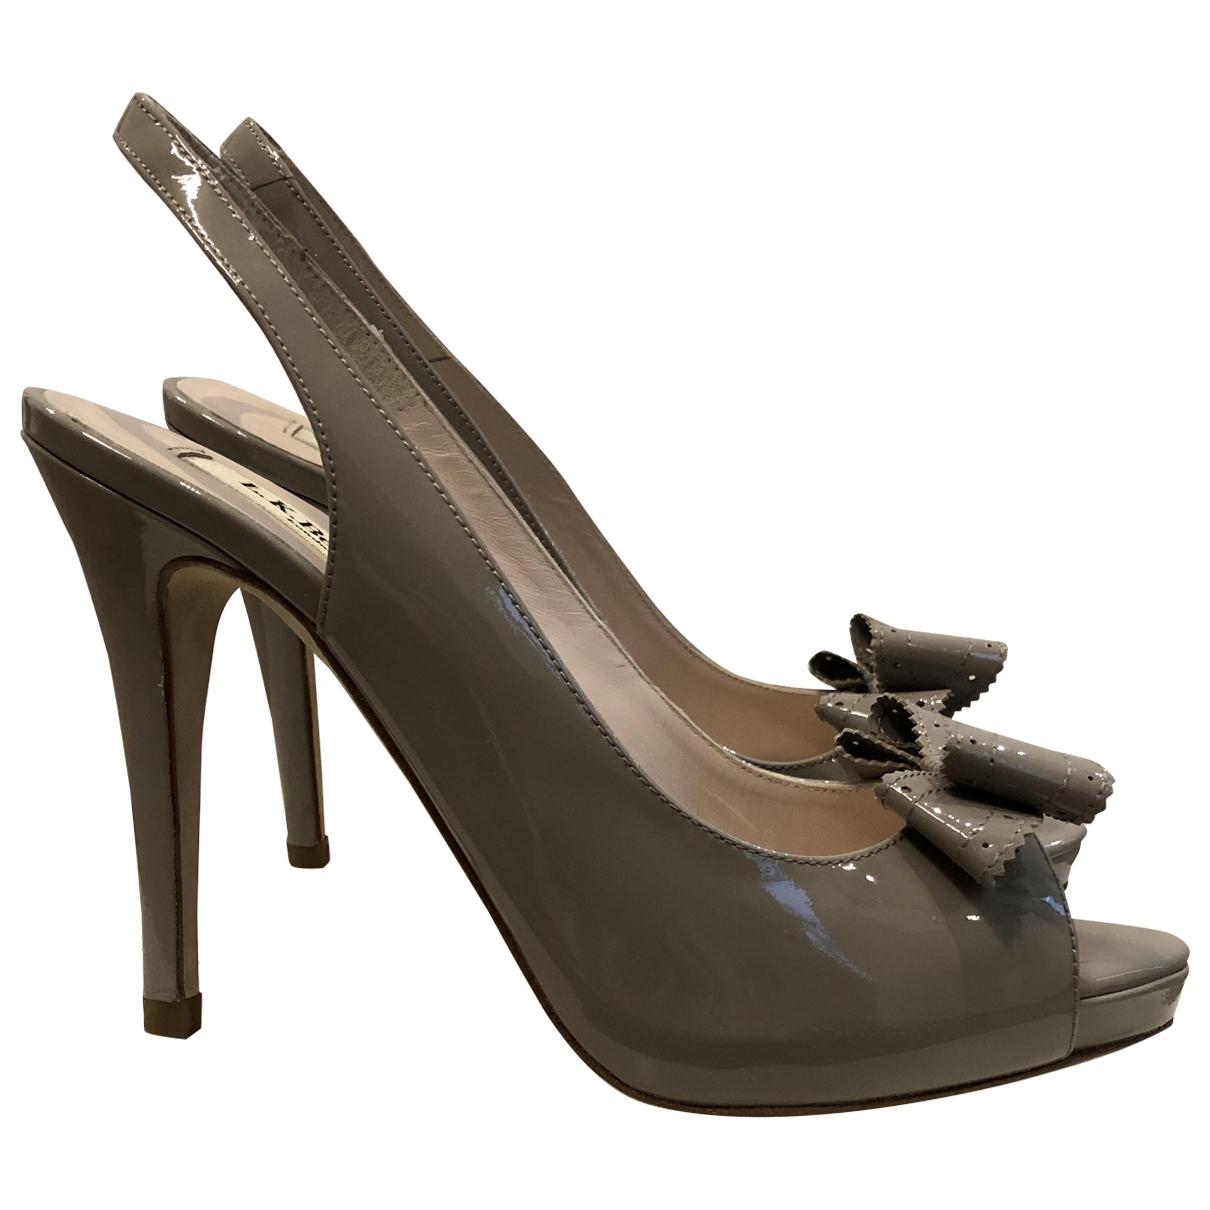 Lk Bennett \N Grey Leather Heels for Women 37.5 EU